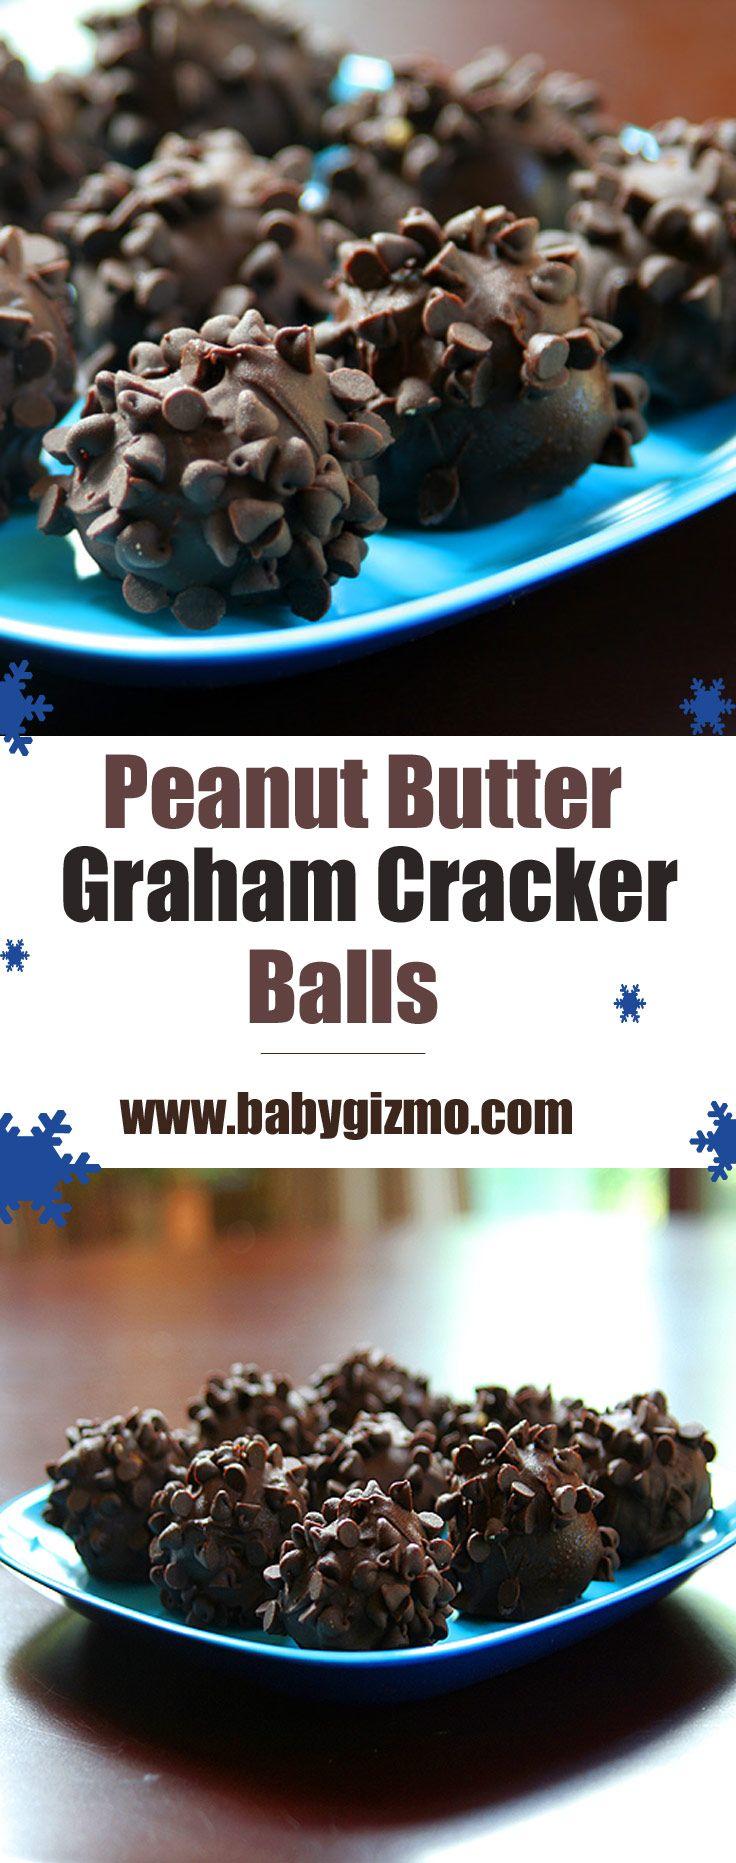 Peanut Butter Graham Cracker Chocolate Balls! So good and easy to make! #chocolate #babygizmo #dessert